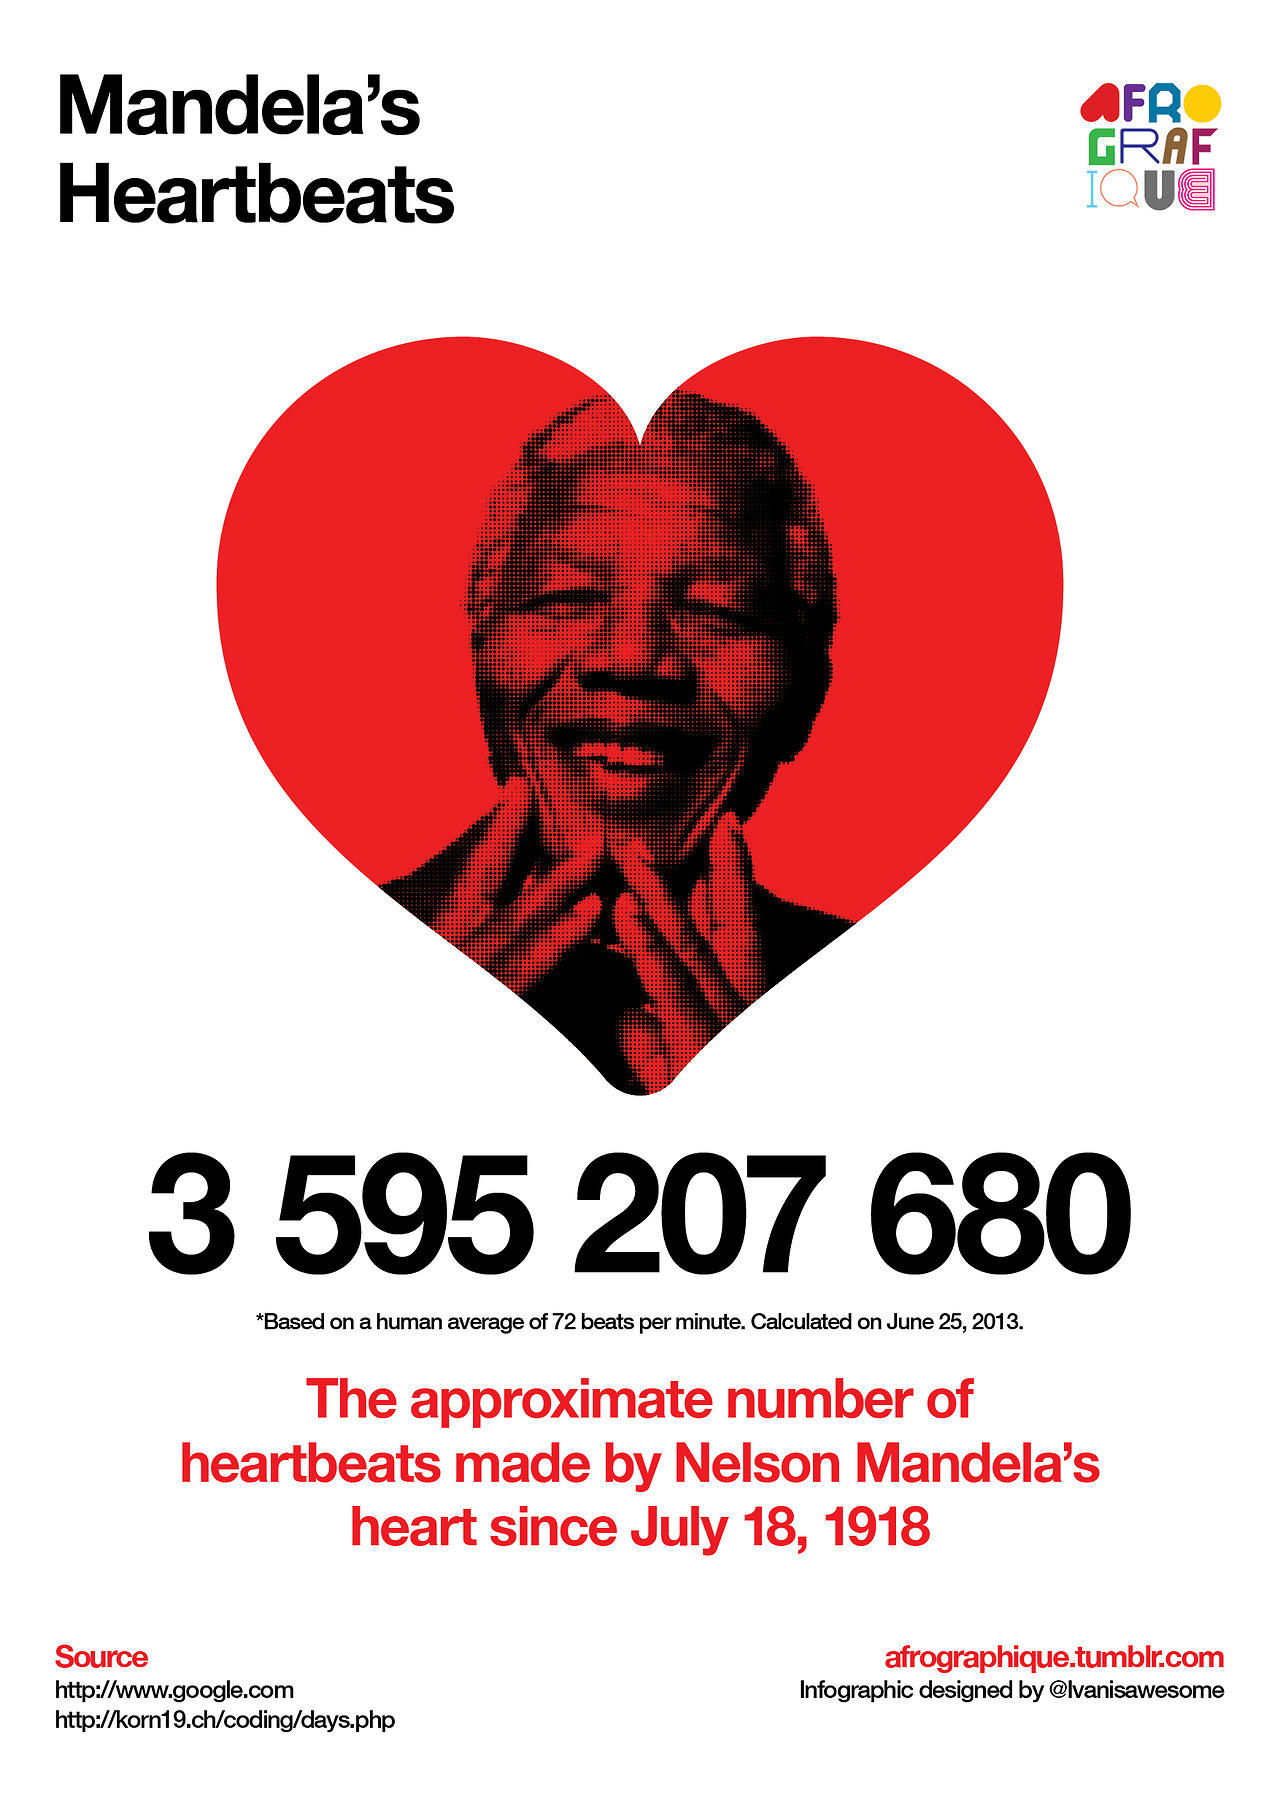 Mandela's Heart Beats